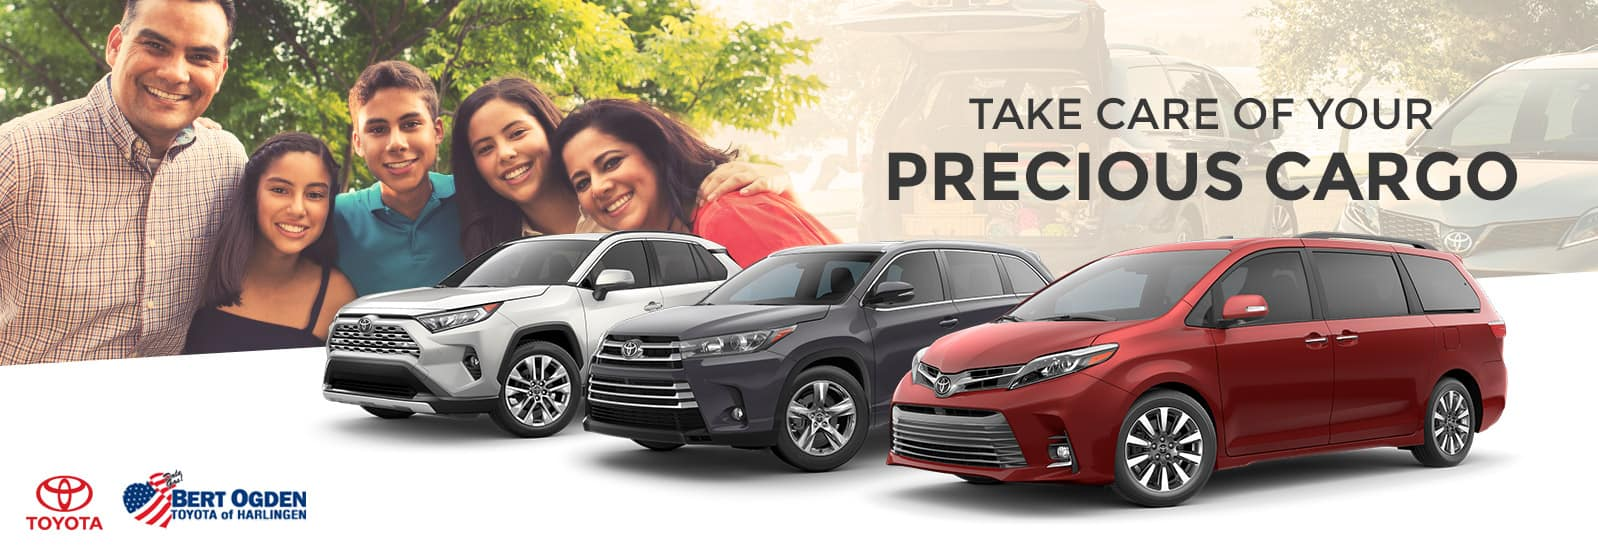 Toyota Models for Large Families | Bert Ogden Toyota | Harlingen, TX